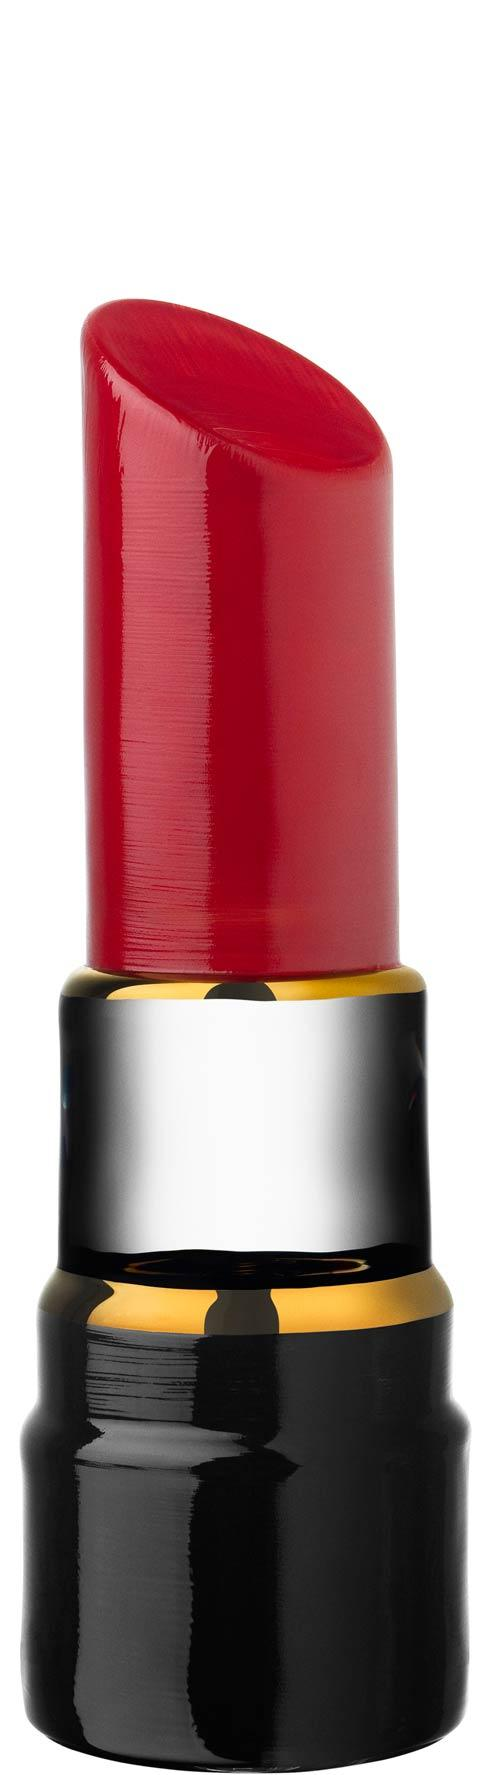 $150.00 Lipstick Red